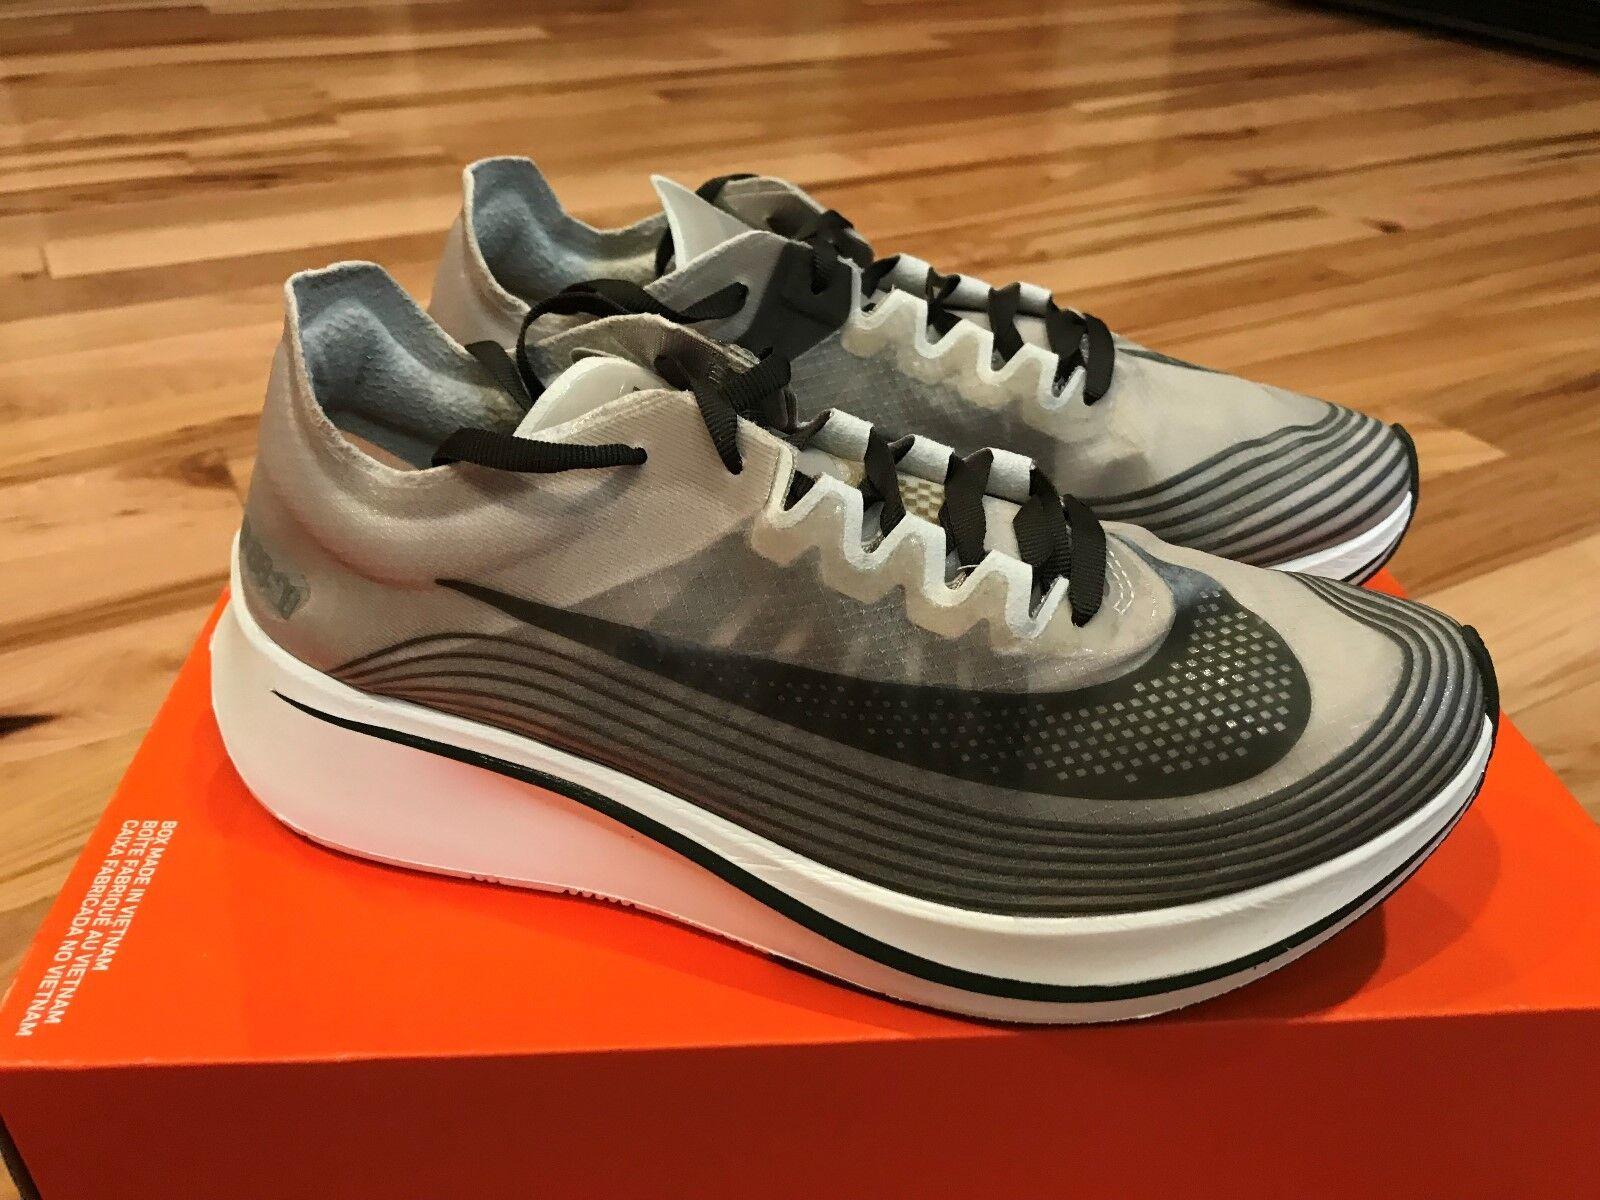 Nike NikeLab Zoom Fly SP Dark Loden Shanghai AA3172-300 Men's Size 7 NO DUSTBAG